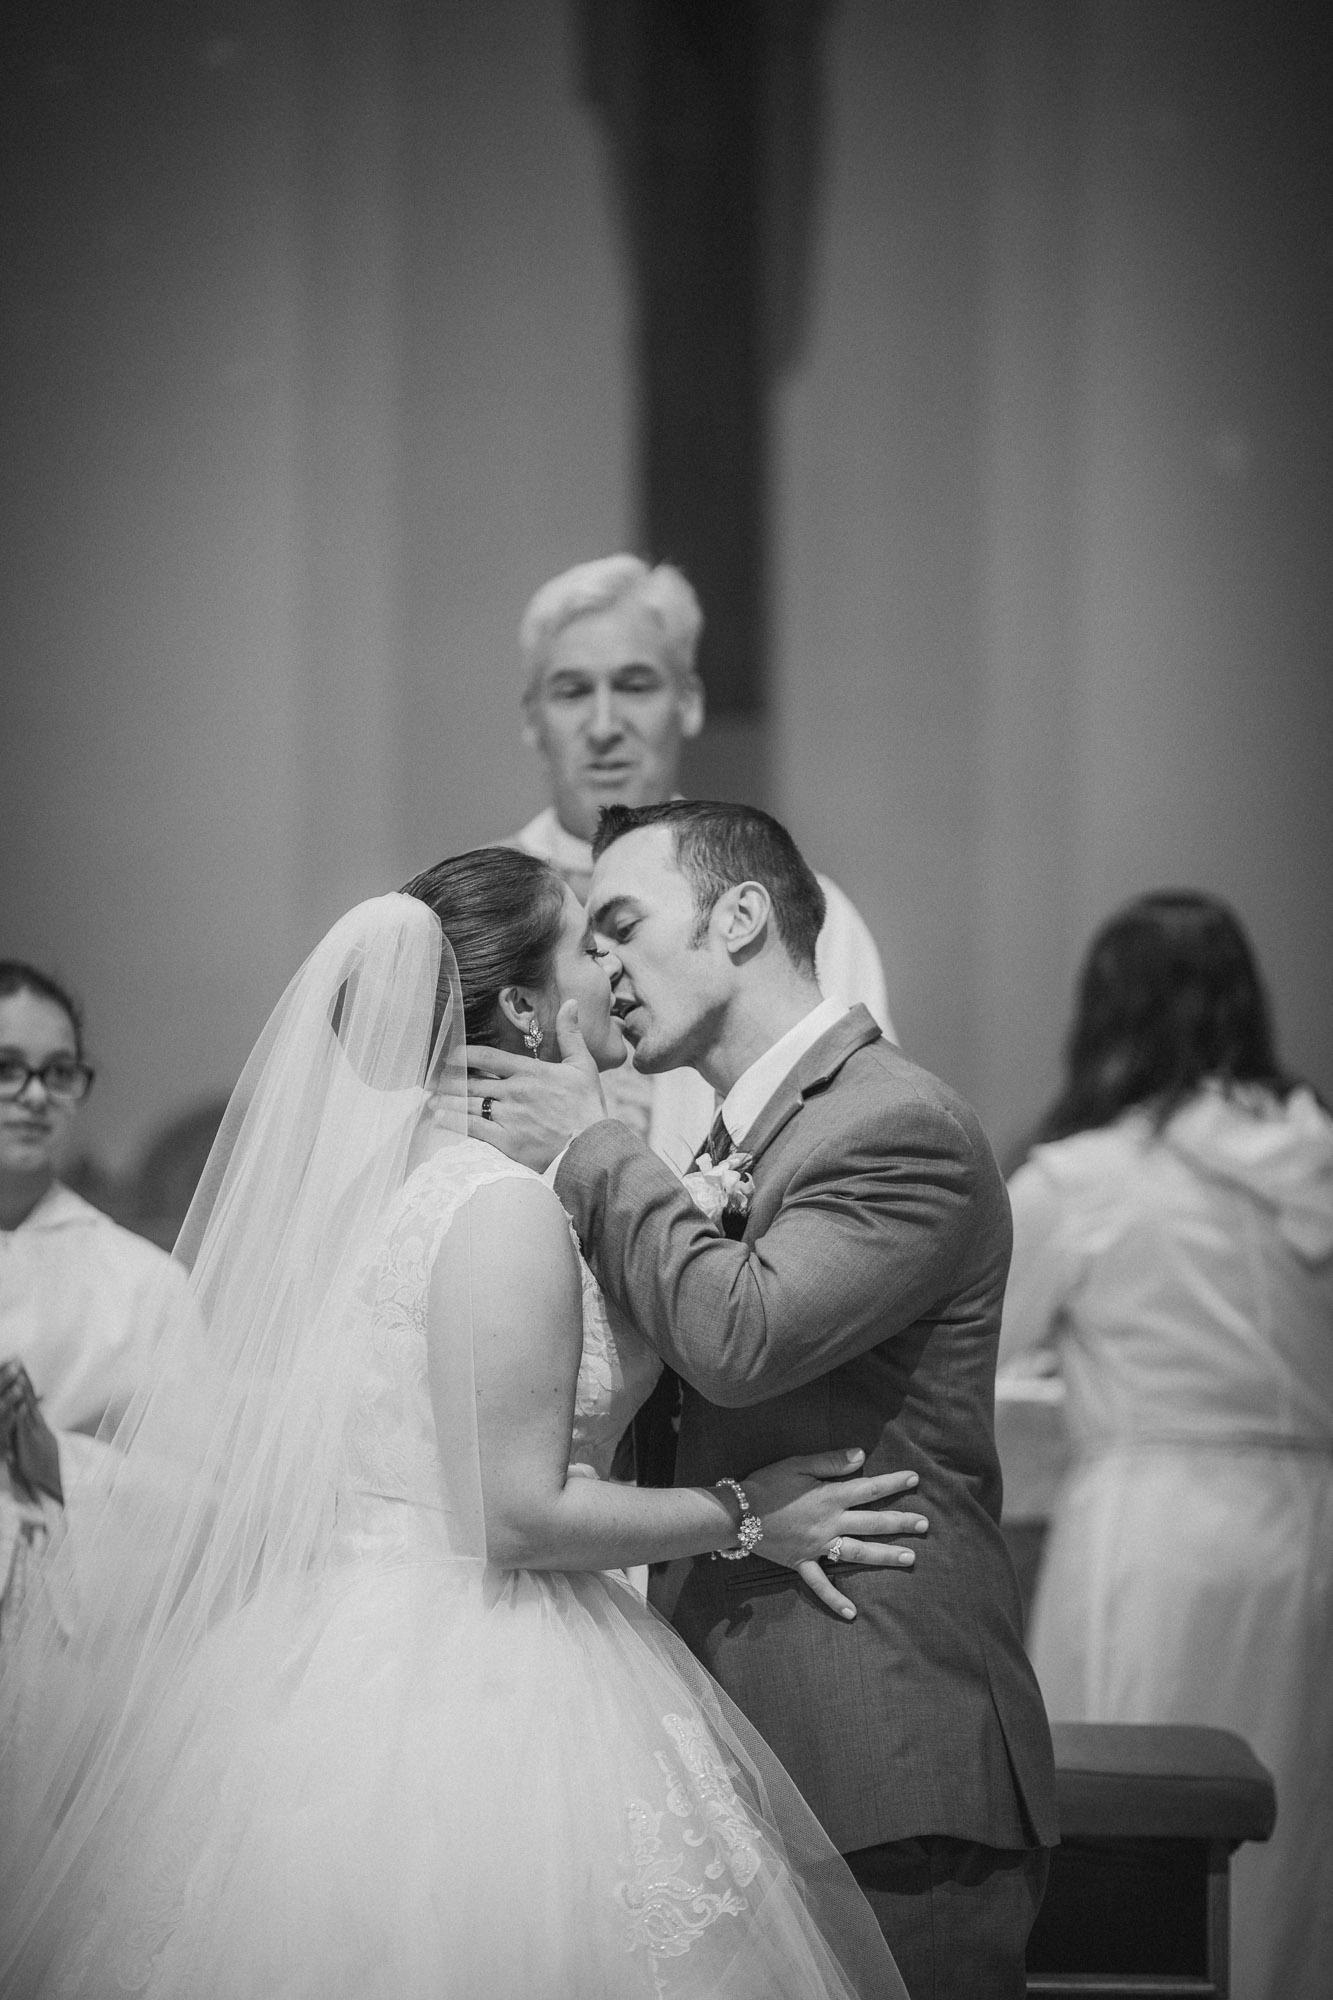 Mike & Danielle's Scranton Wedding Photography 42